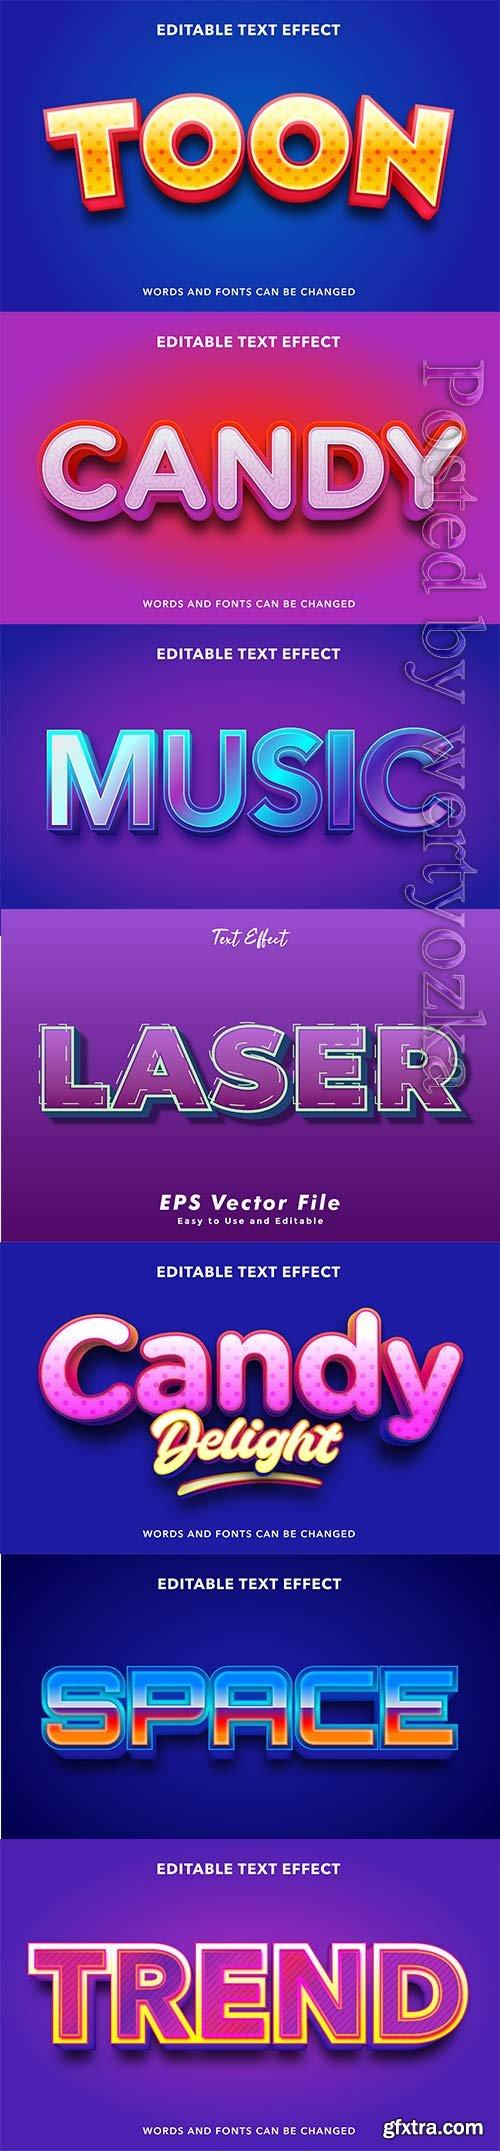 3d editable text style effect vector vol 249